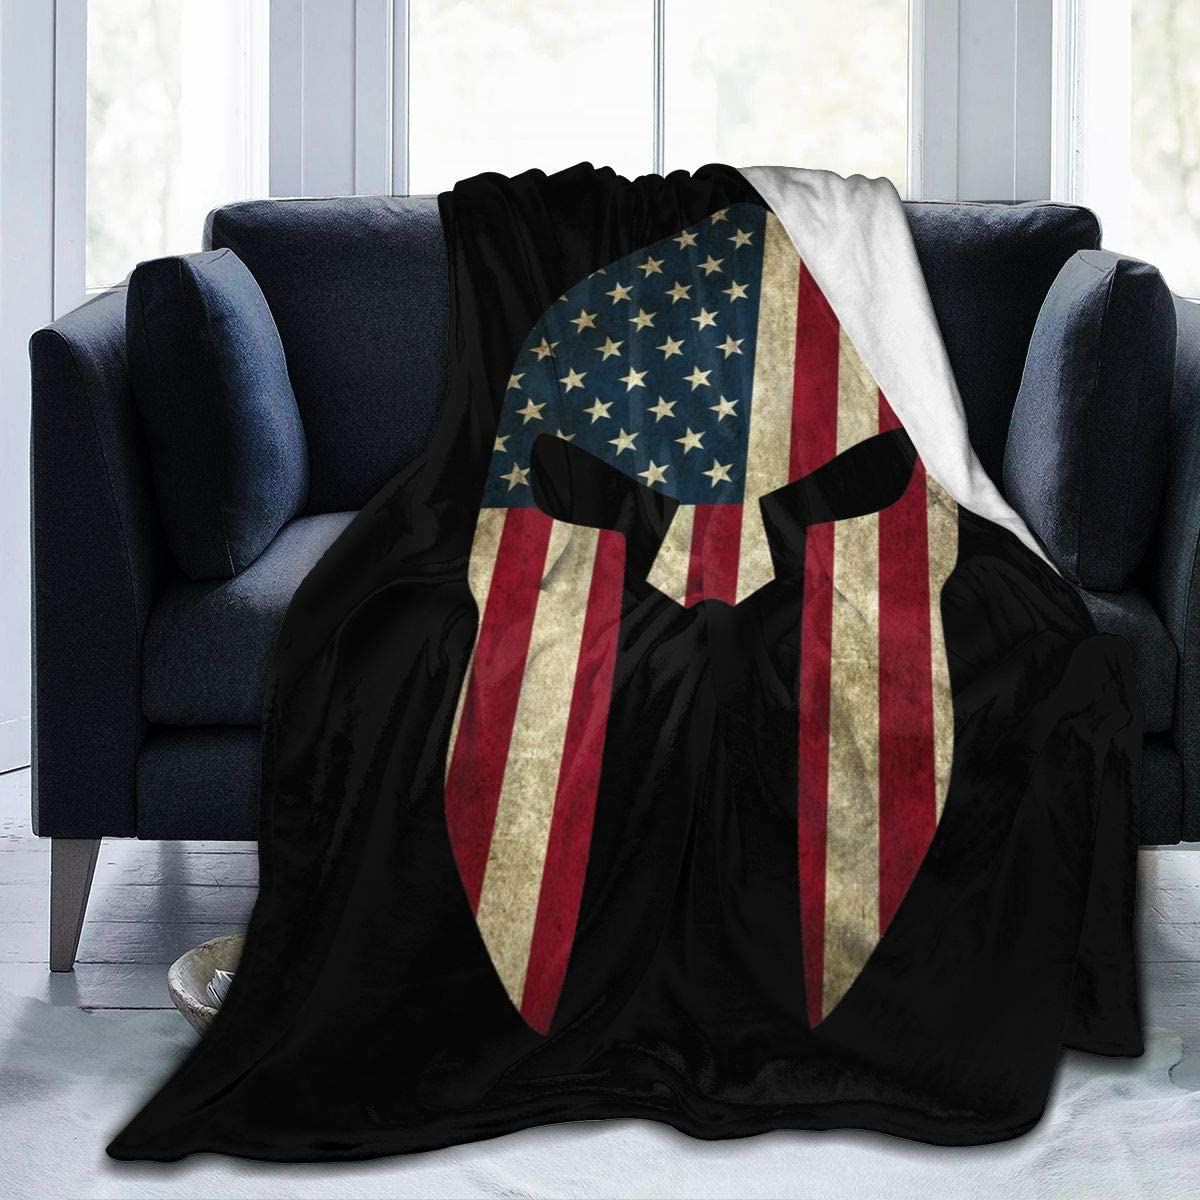 NOT American Spartan Warrior Helmet Ultra-Soft Blanket Winter Bed Sofa Home Office Quilt